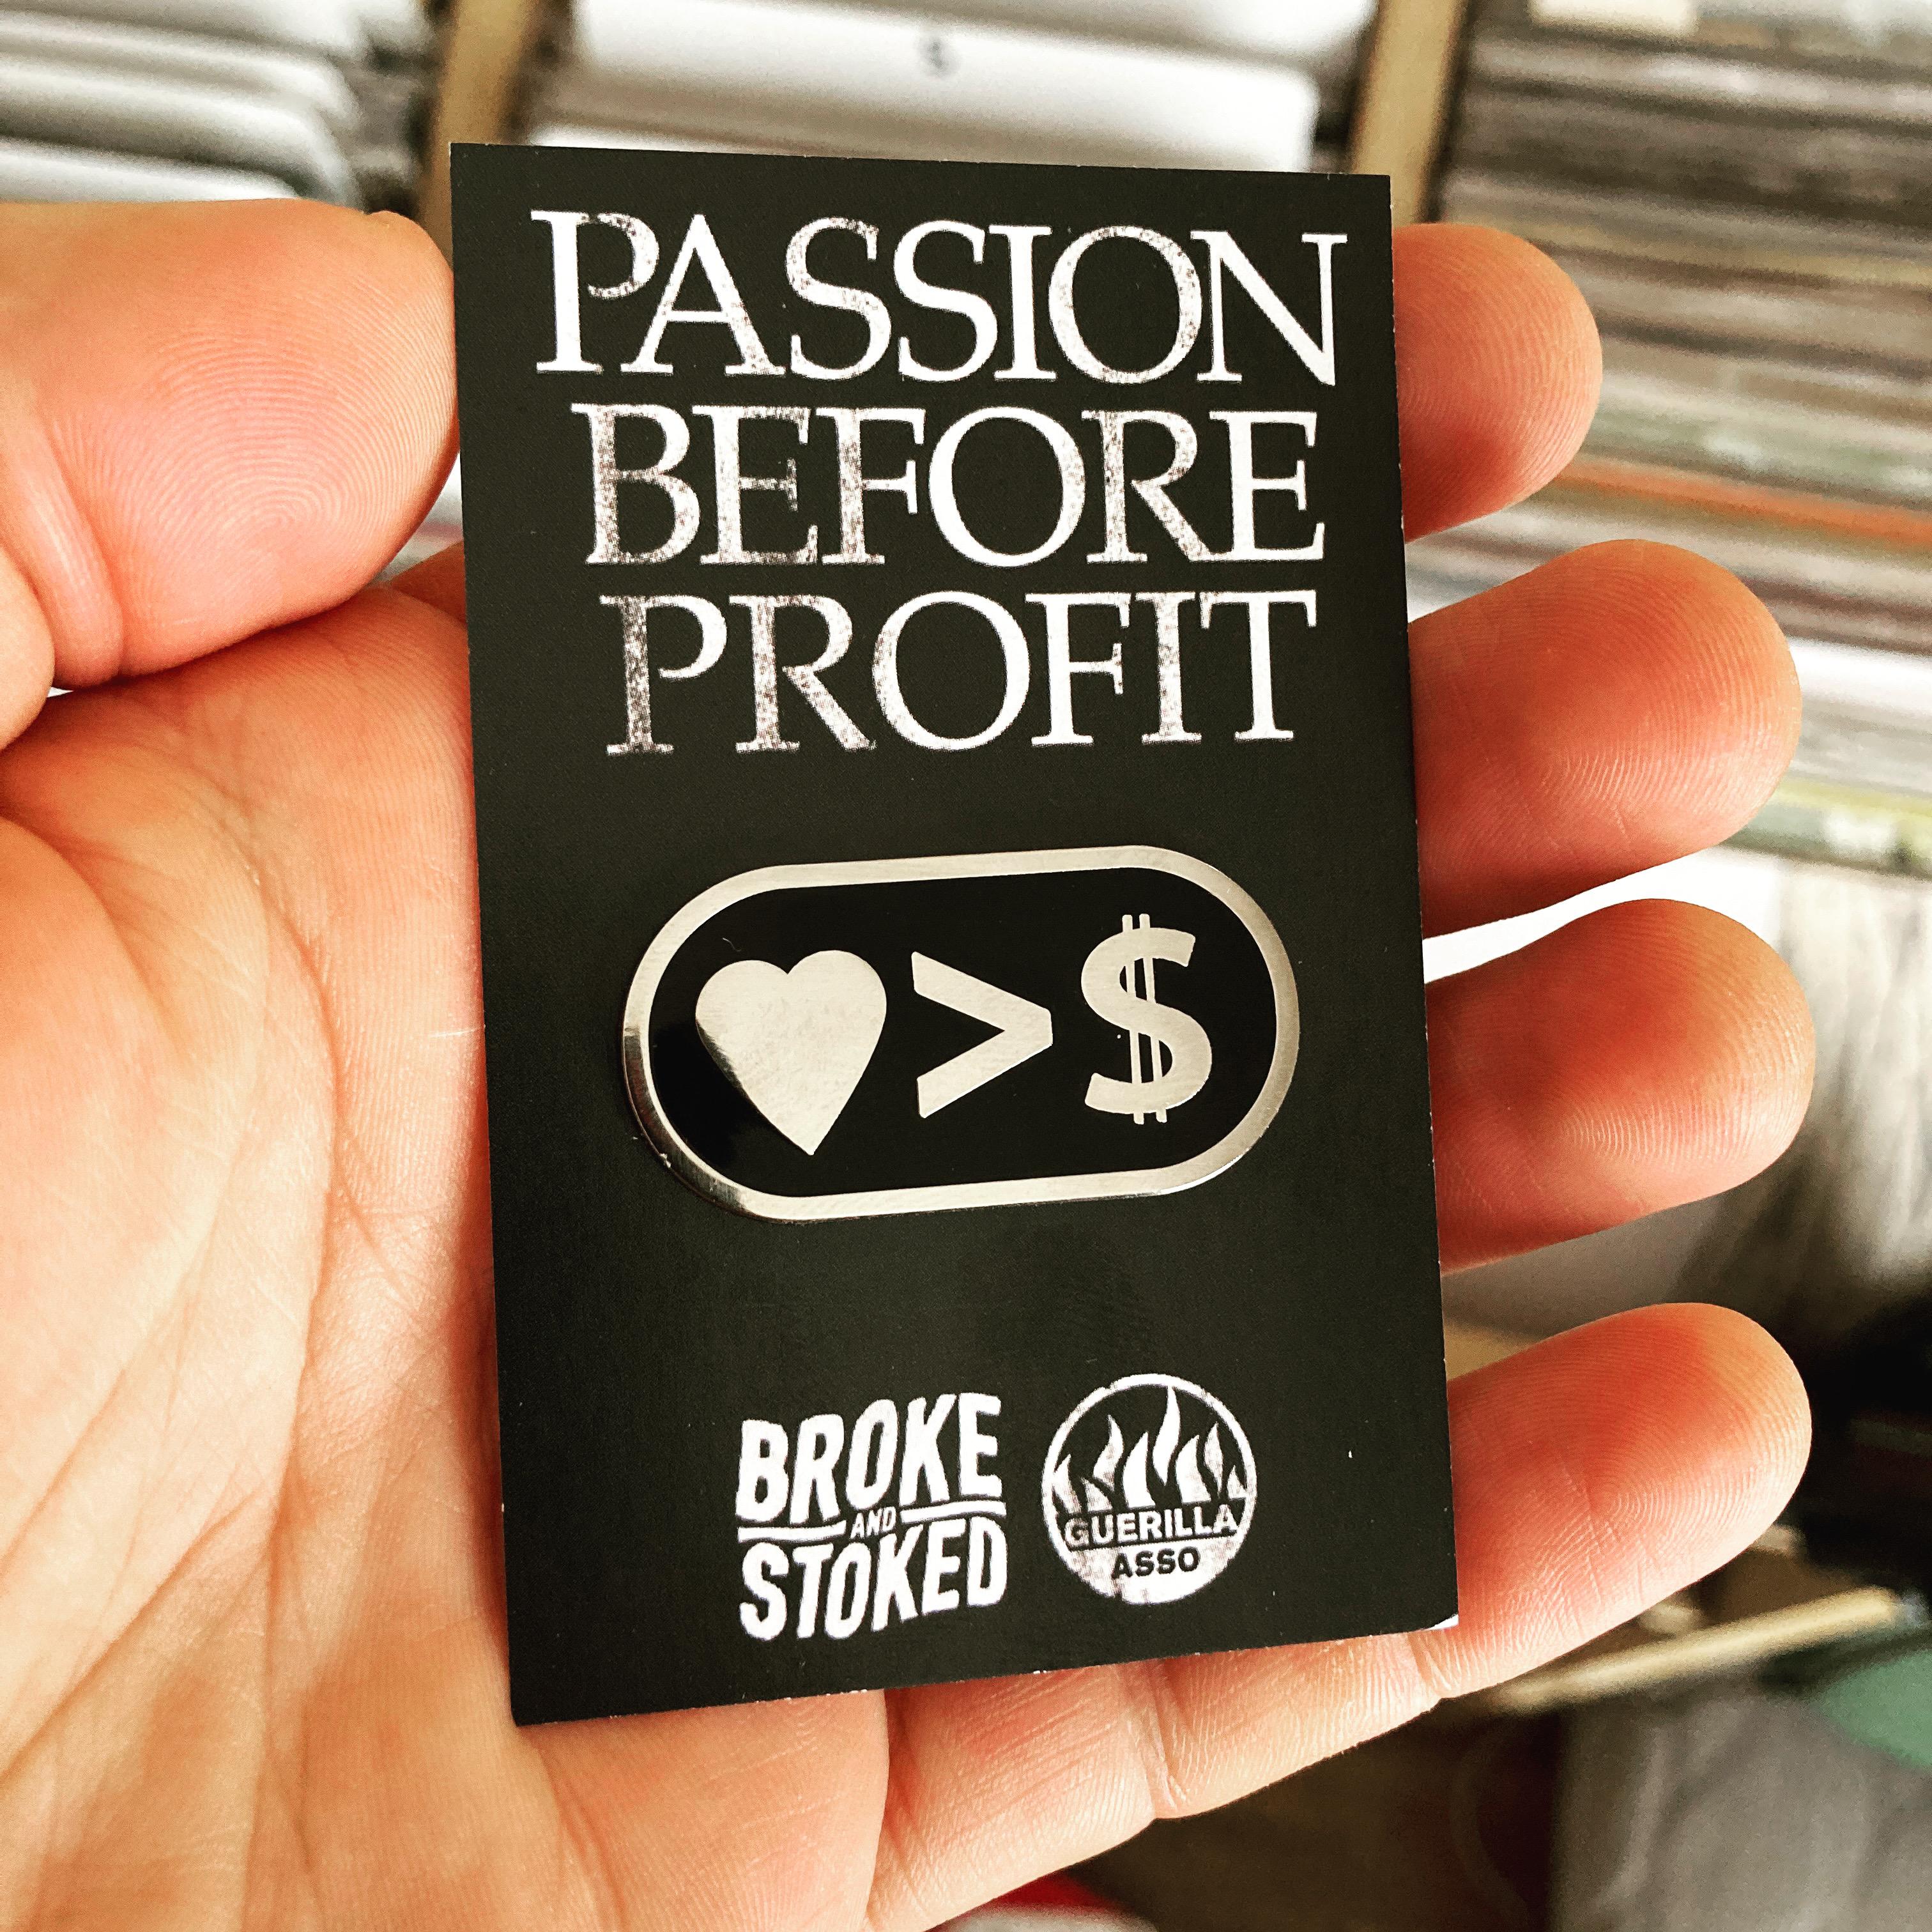 Guerilla Asso - PINS passion before profit